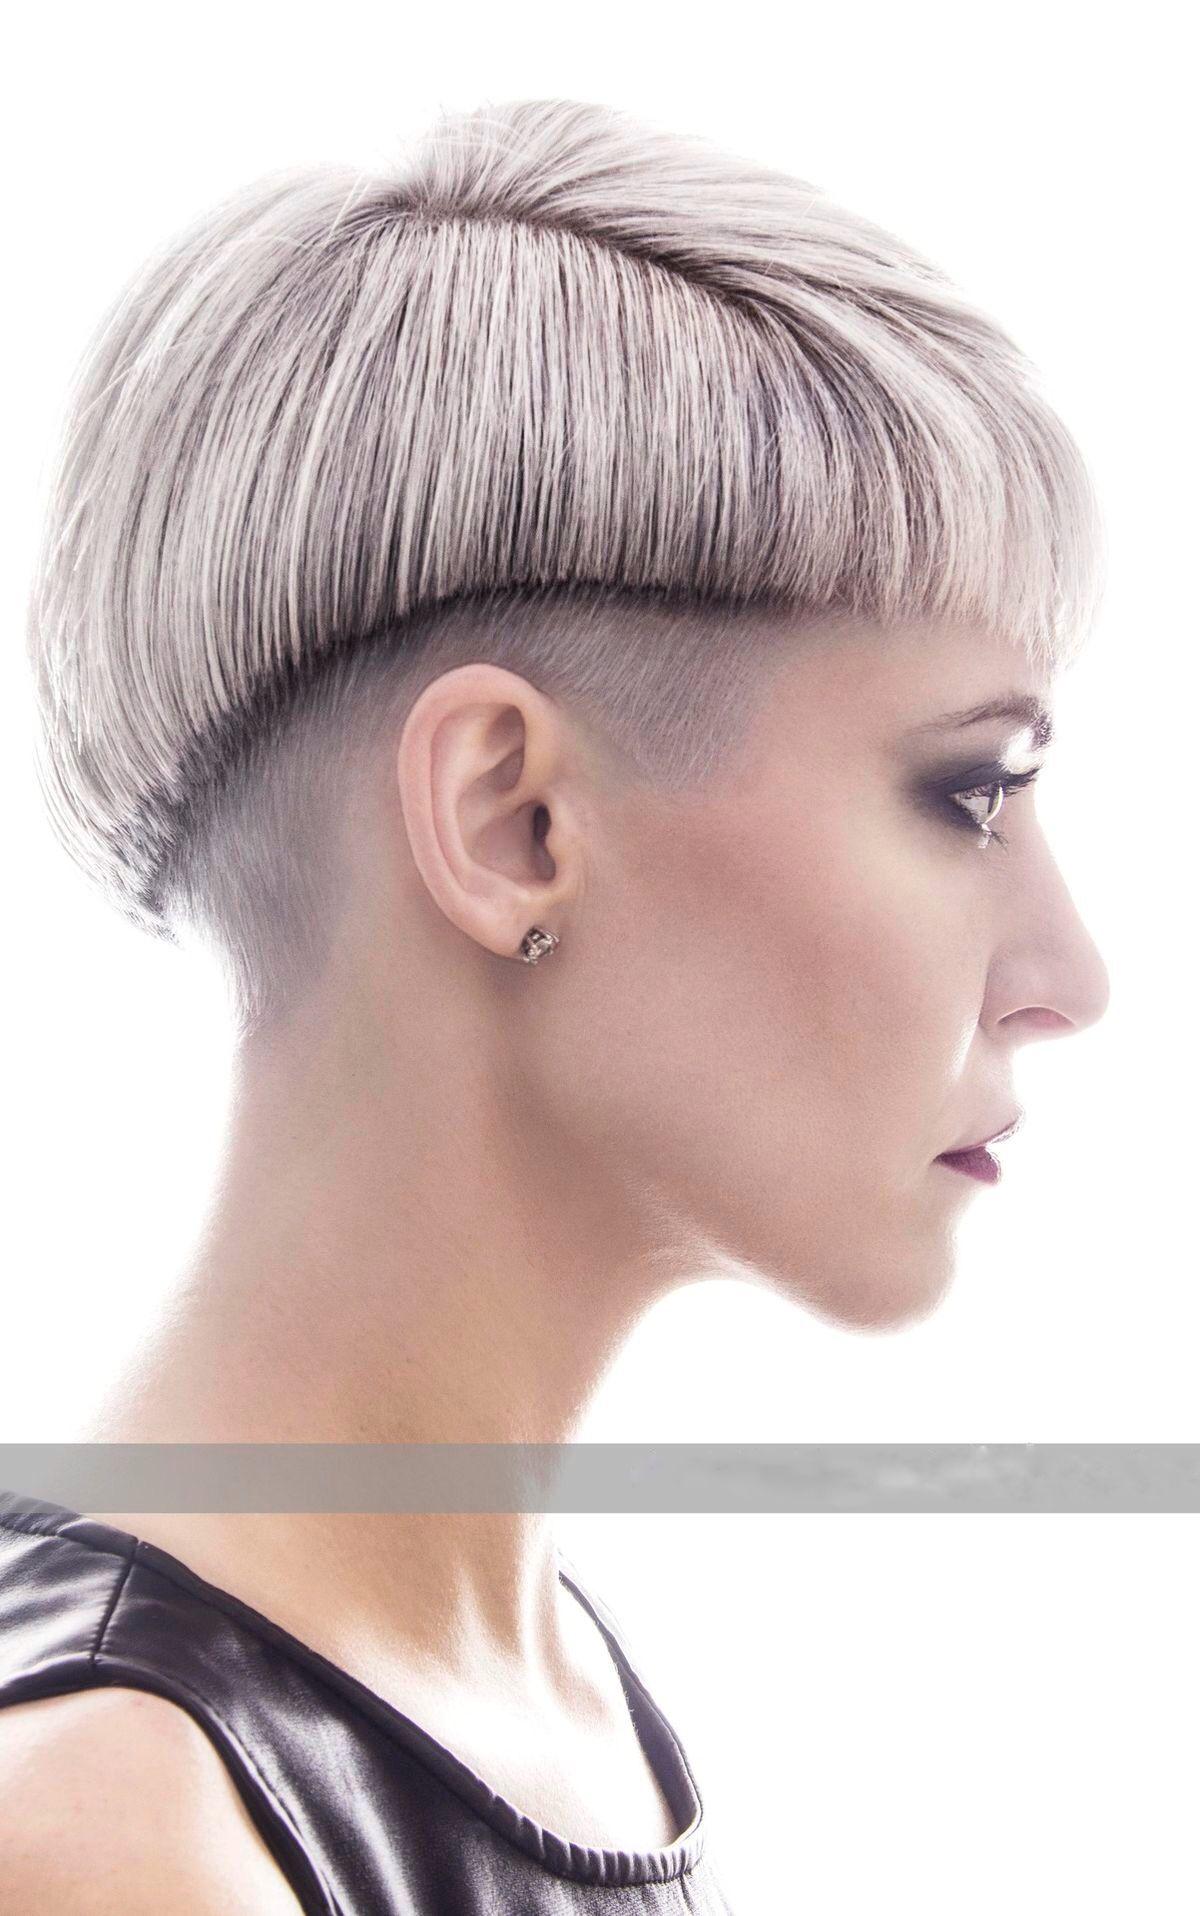 Bowl Undercut Coiffure Pinterest Short Hair Styles Hair And